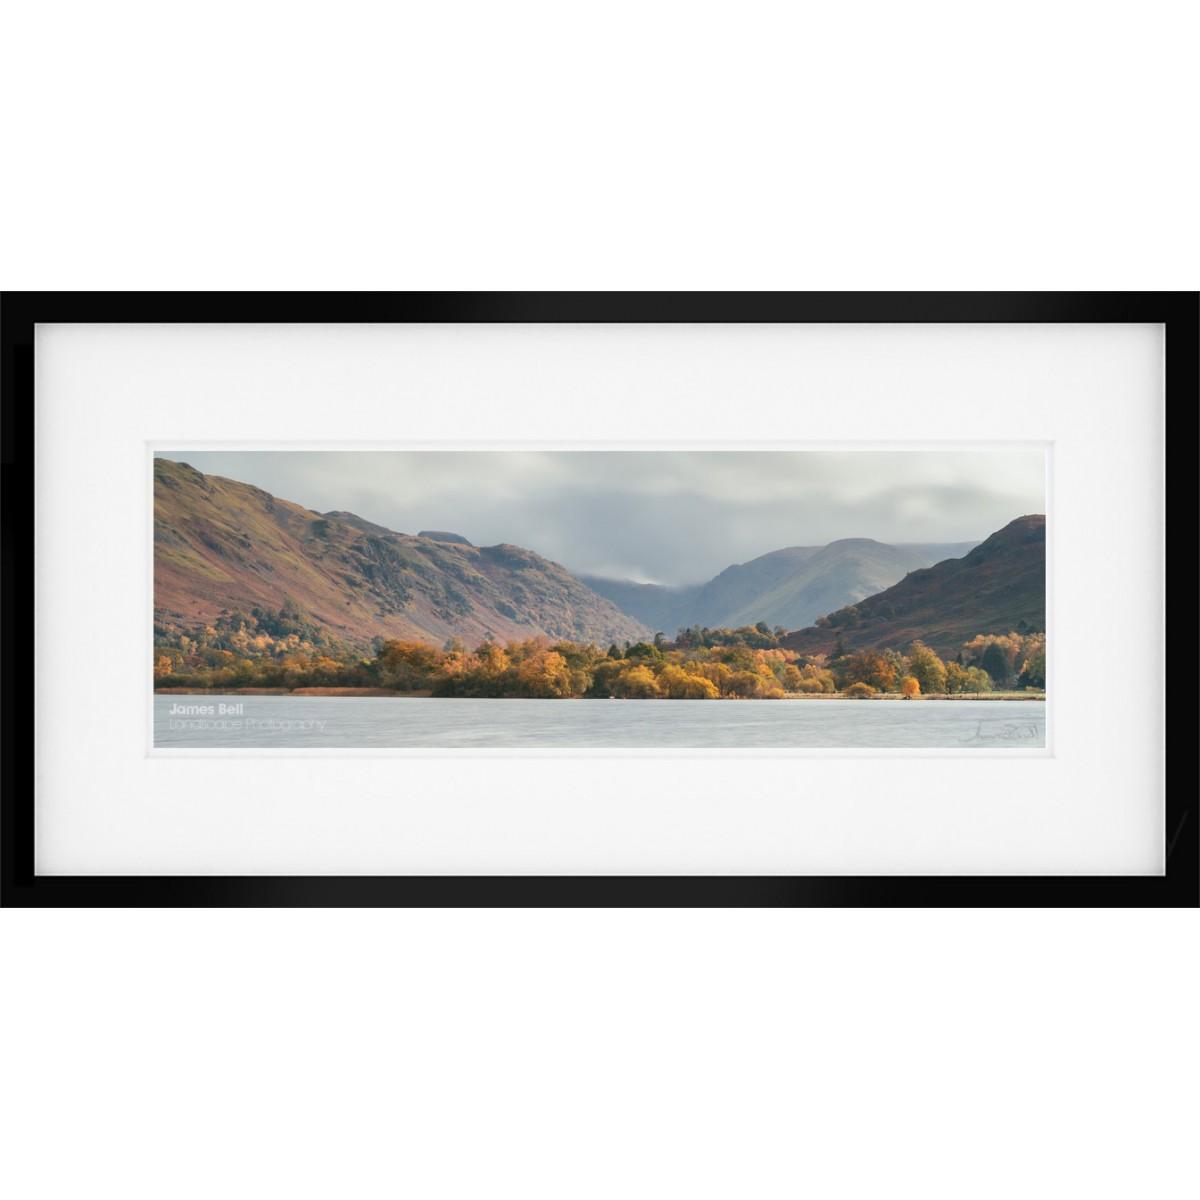 Glenridding View Framed Print